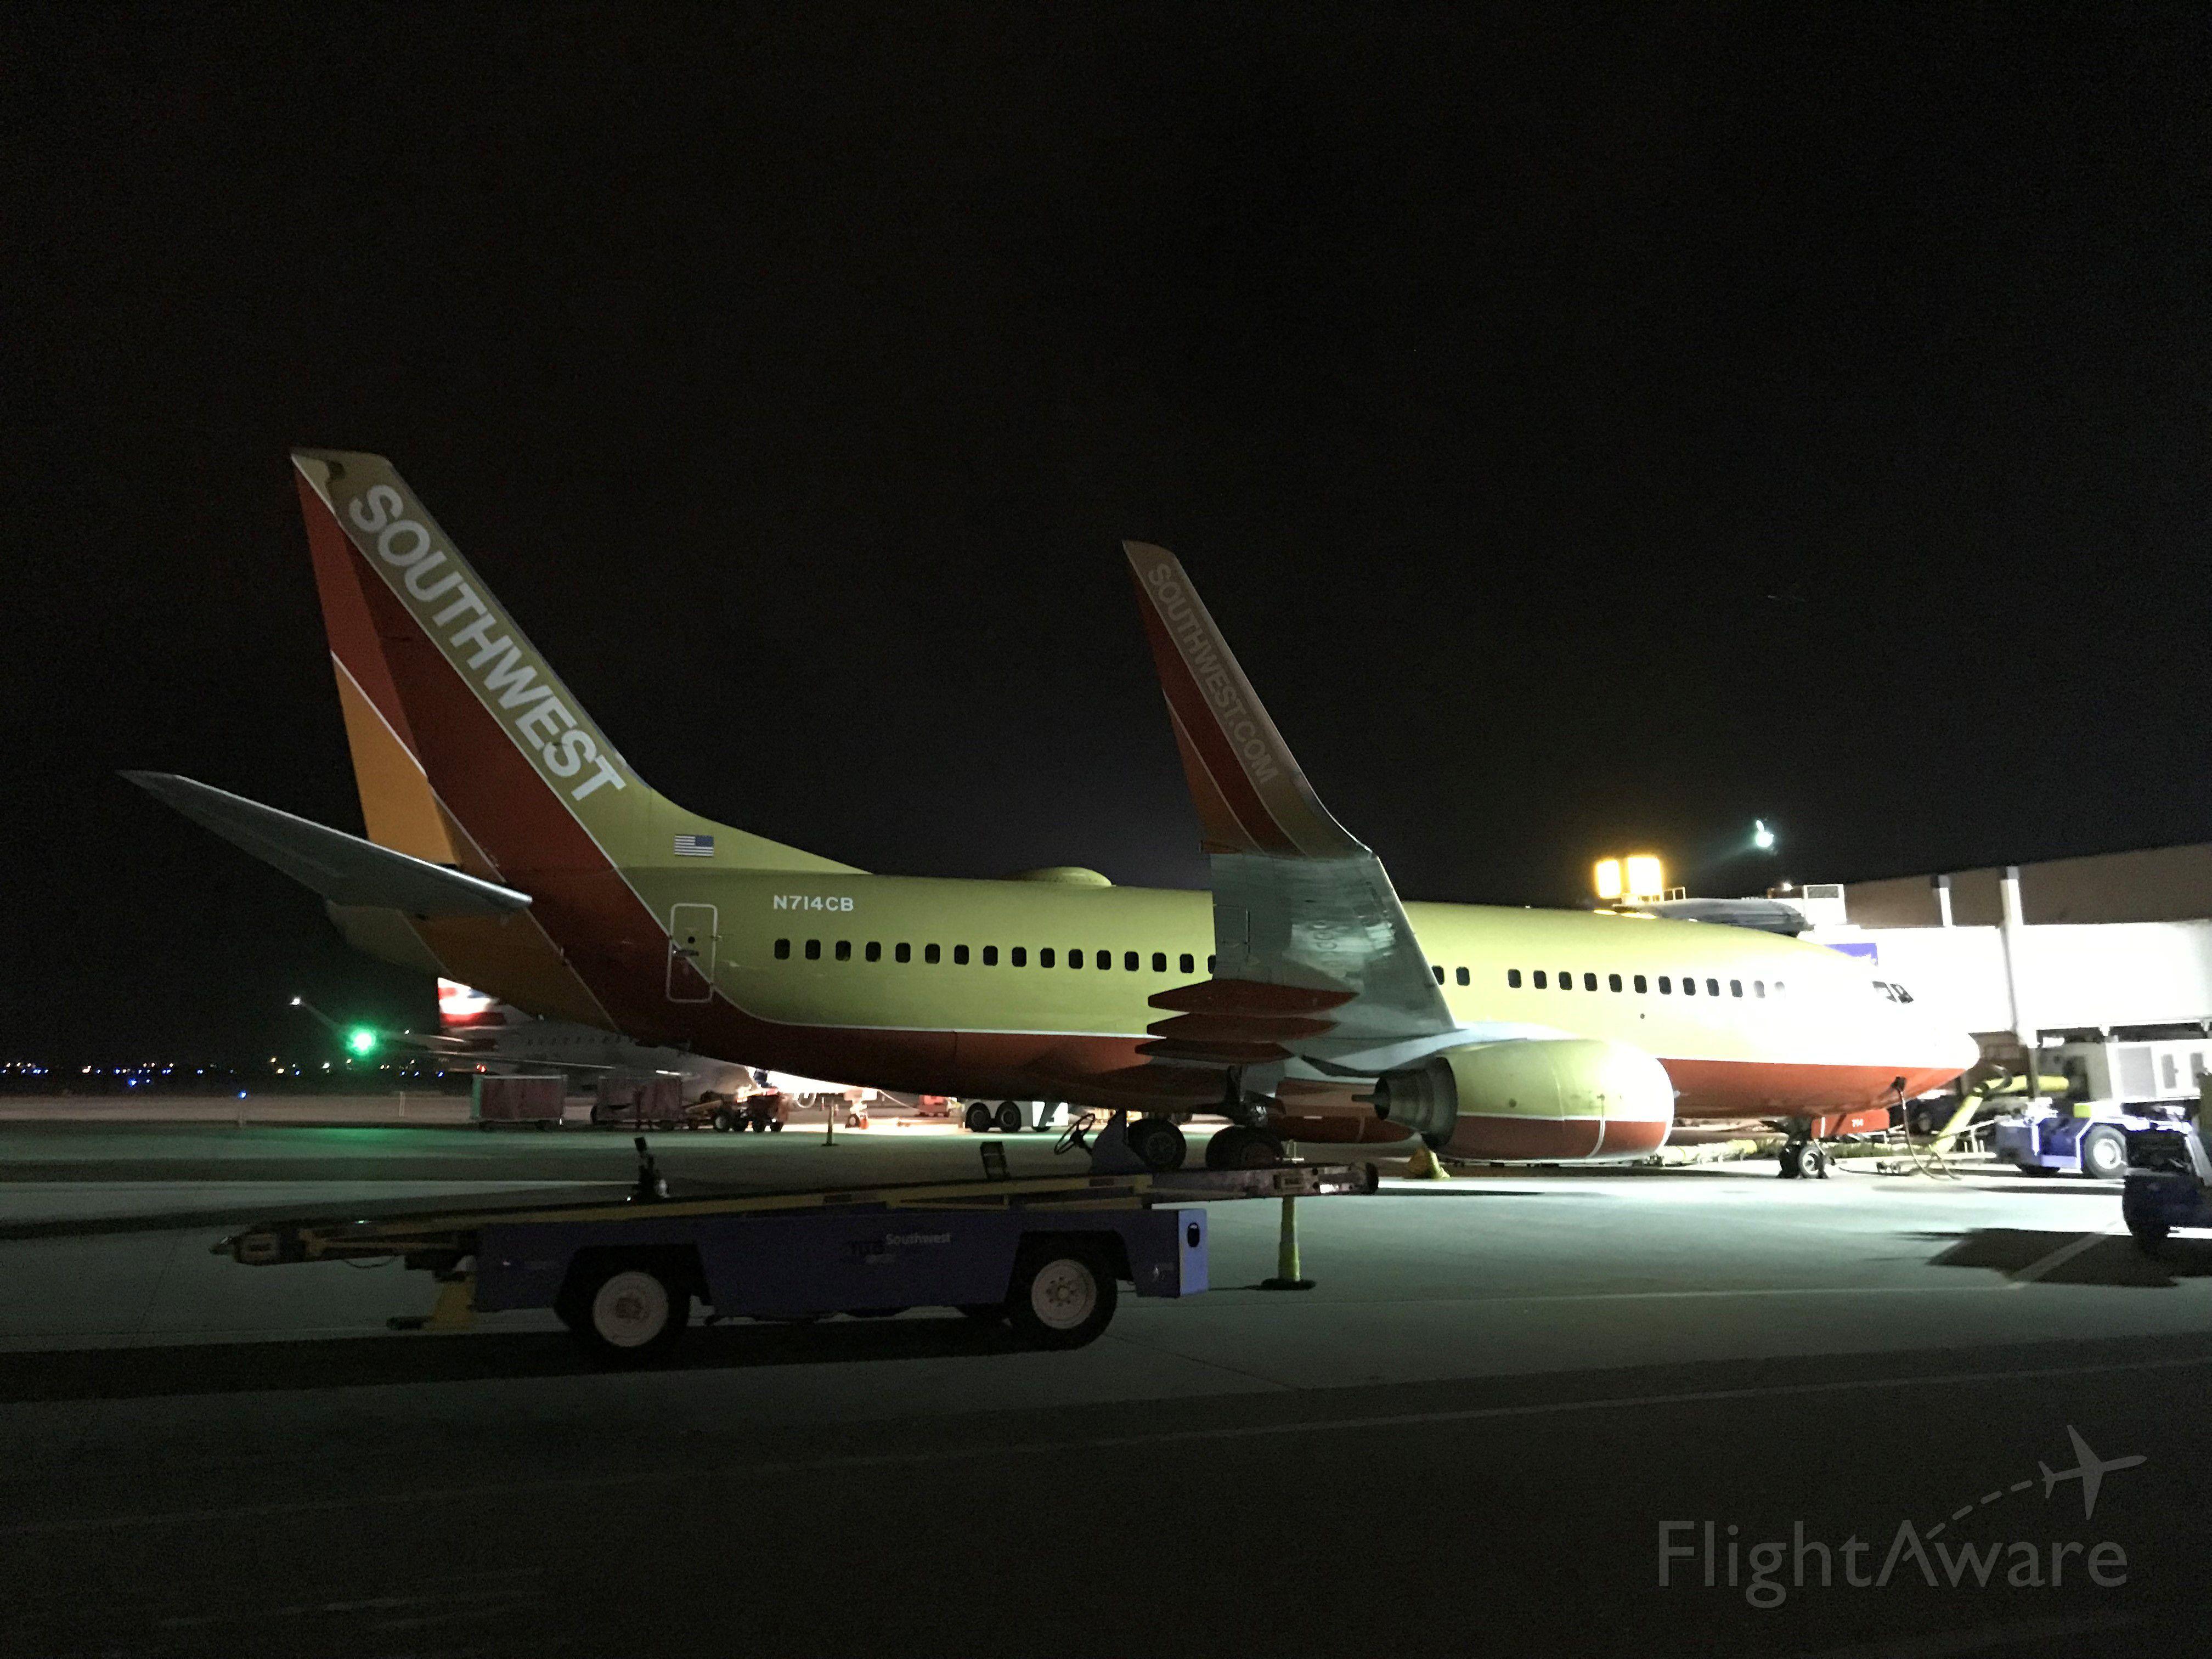 Boeing 737-700 (N714CB) - SWA Classic Livery